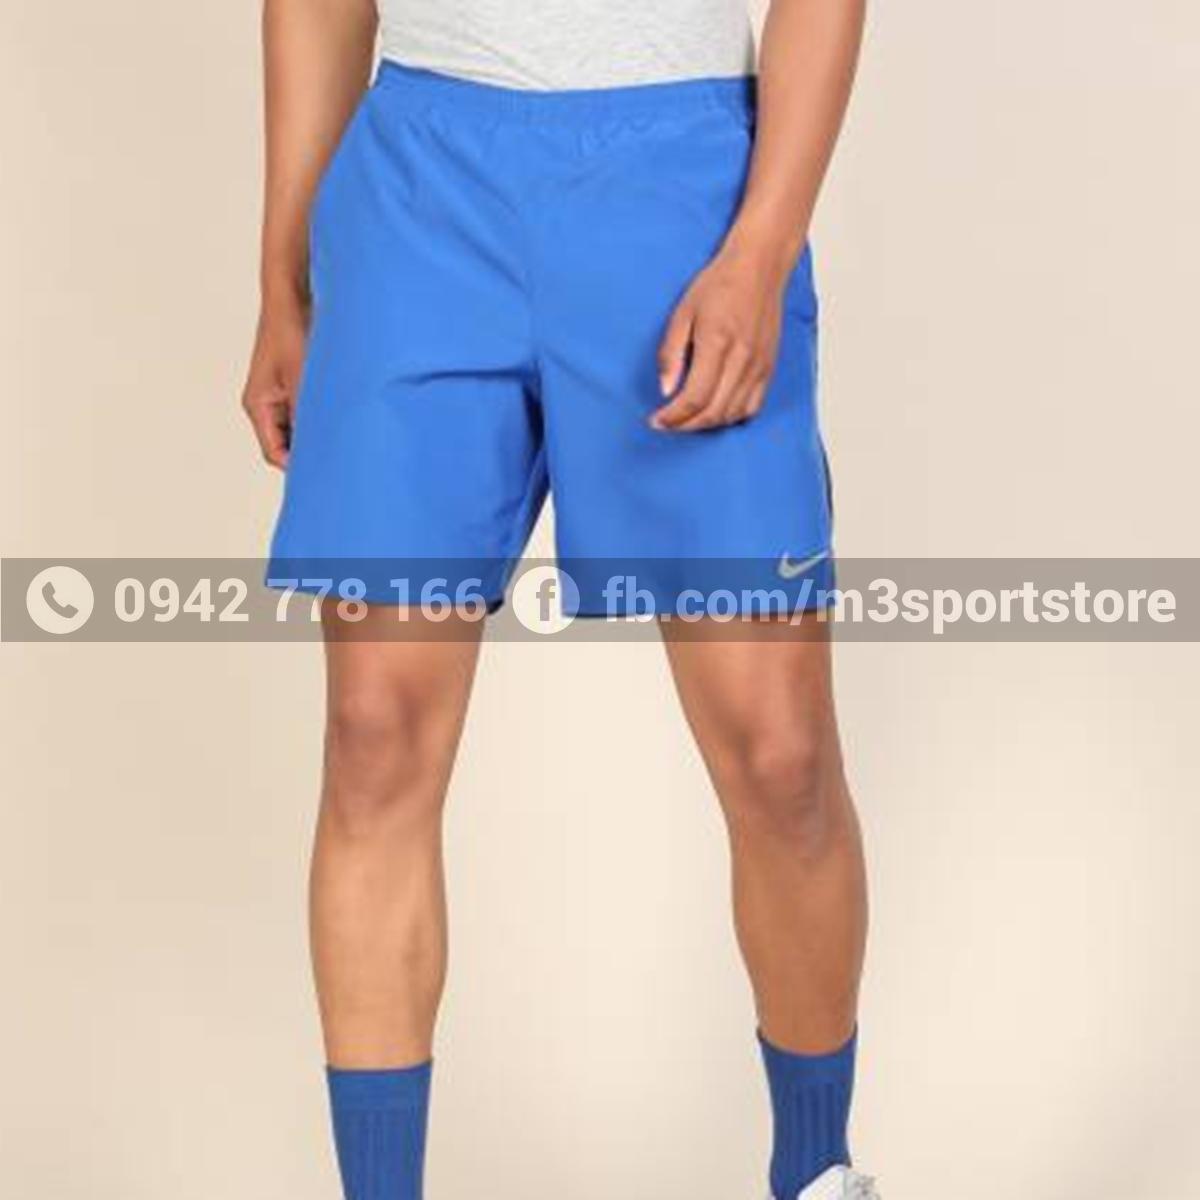 Quần short thể thao nam Nike Running CK0451